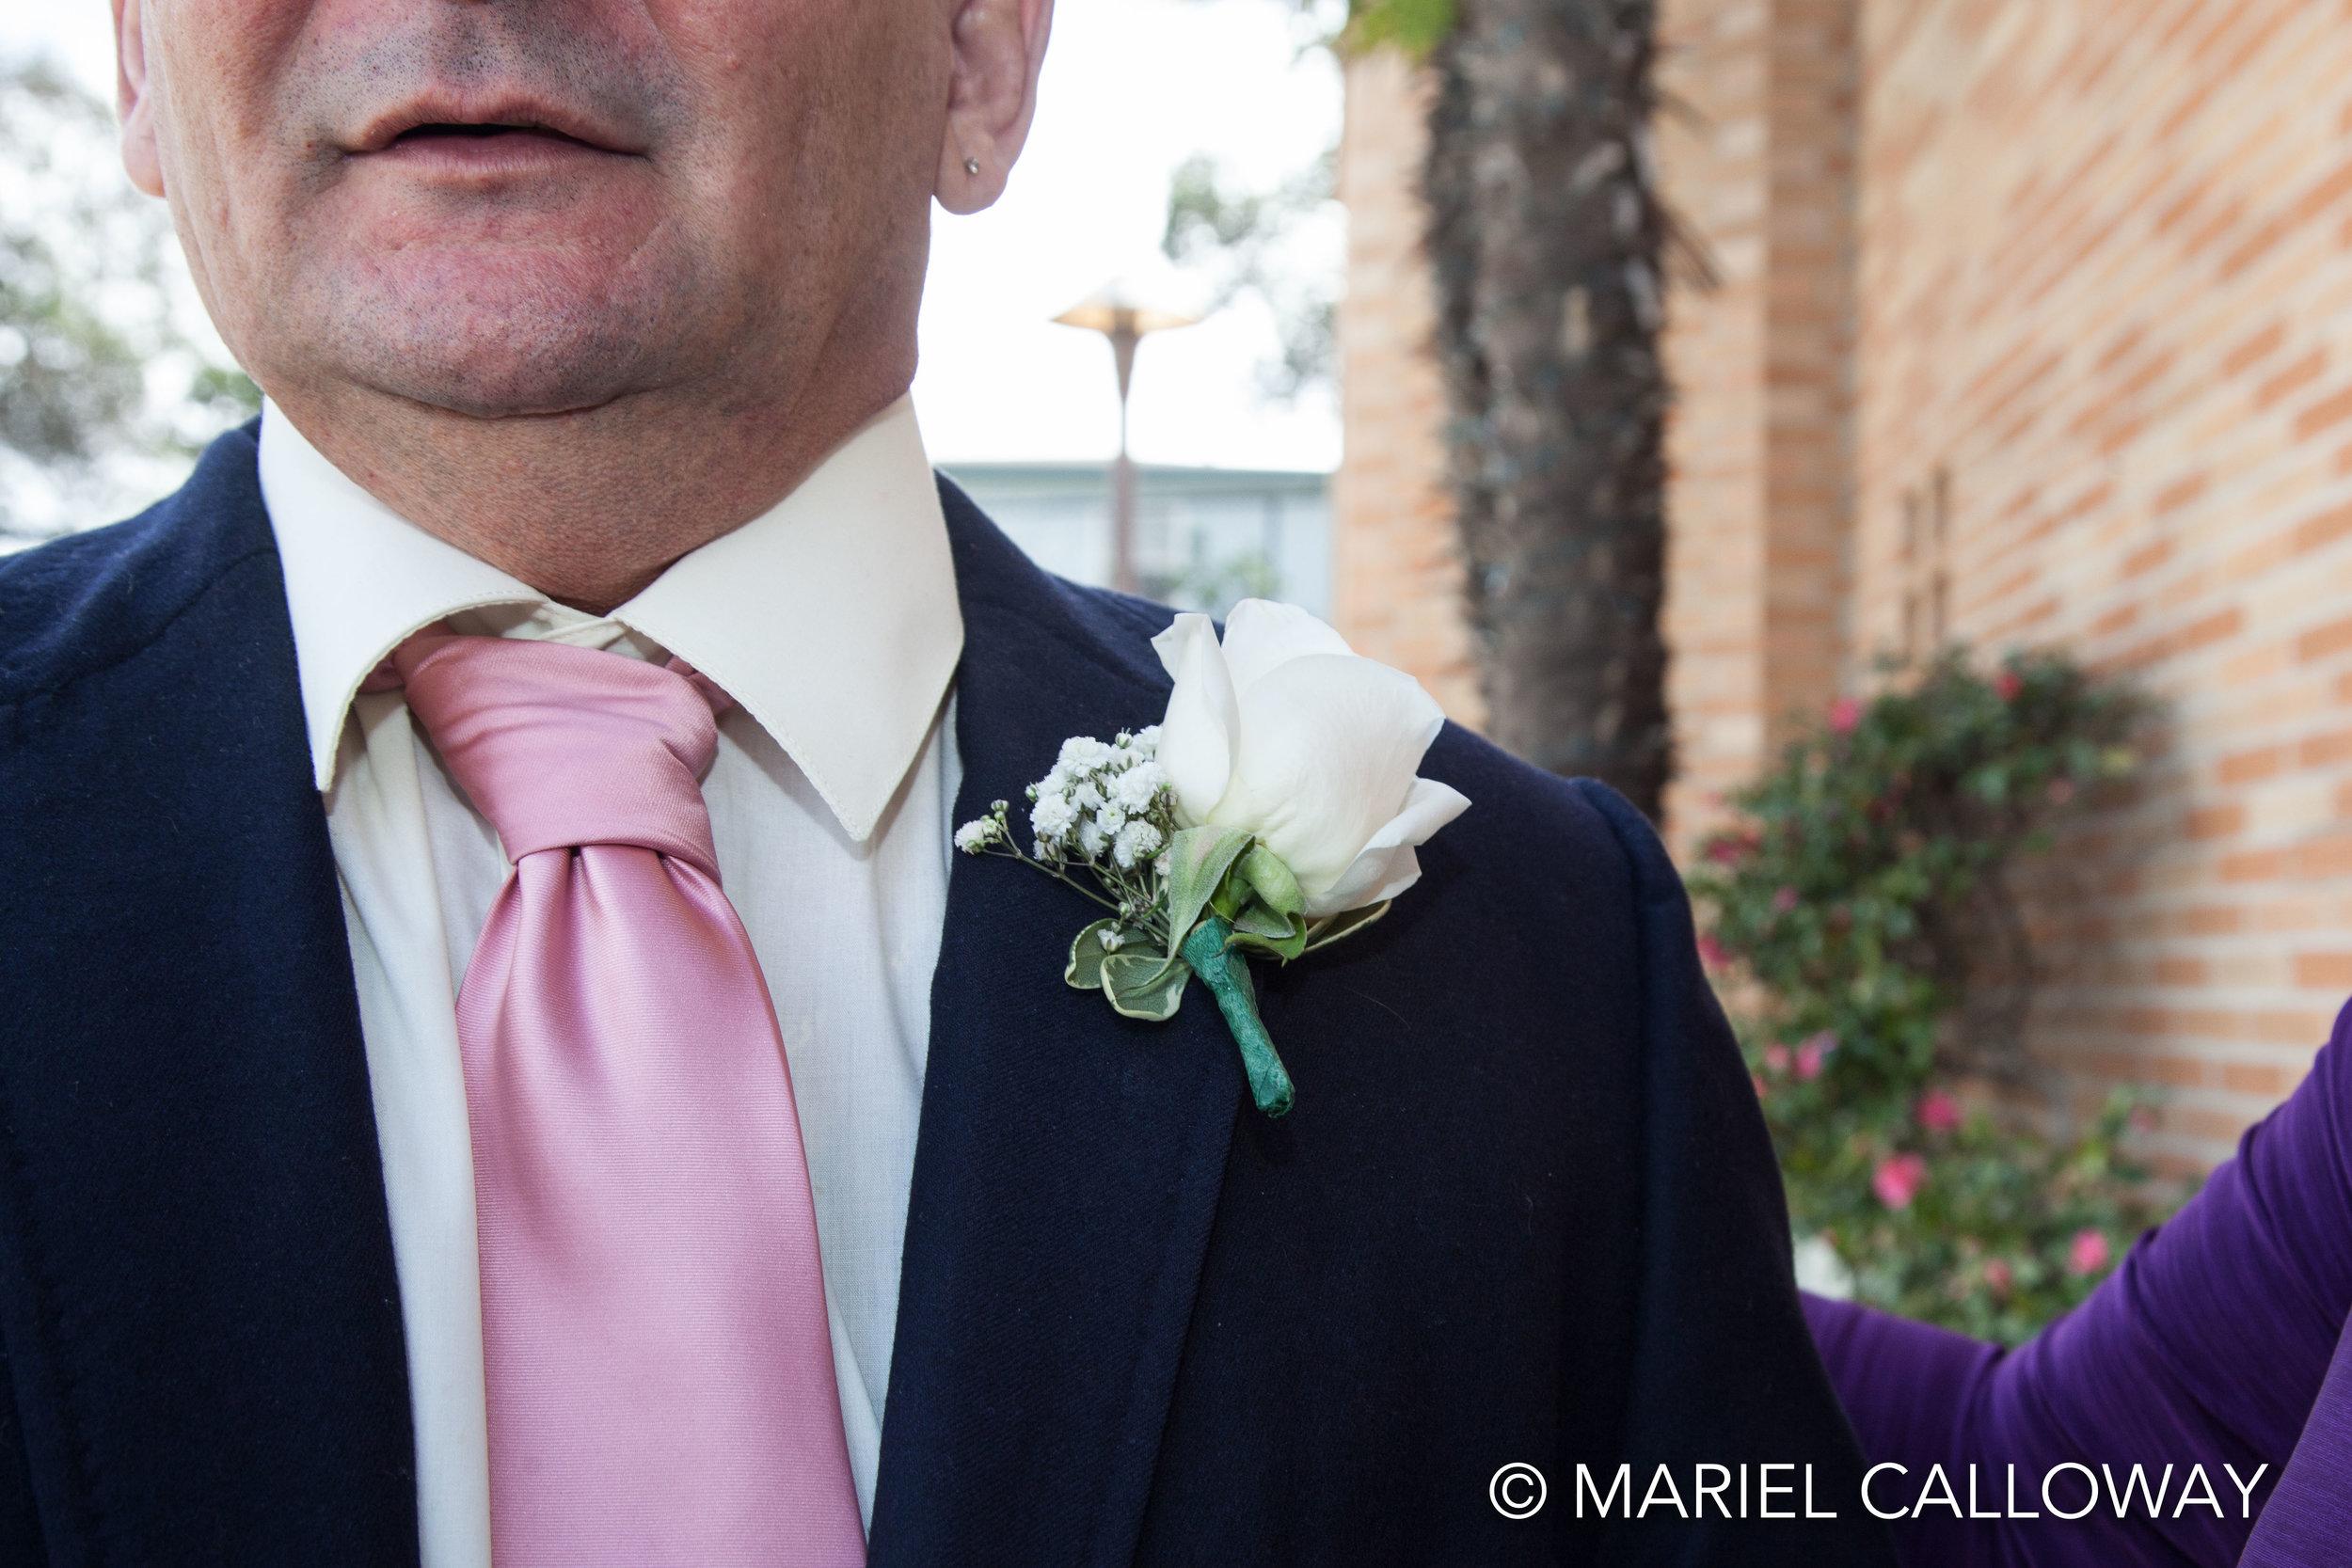 Mariel-Calloway-Los-Angeles-Wedding-Photography-Rossi-37.jpg